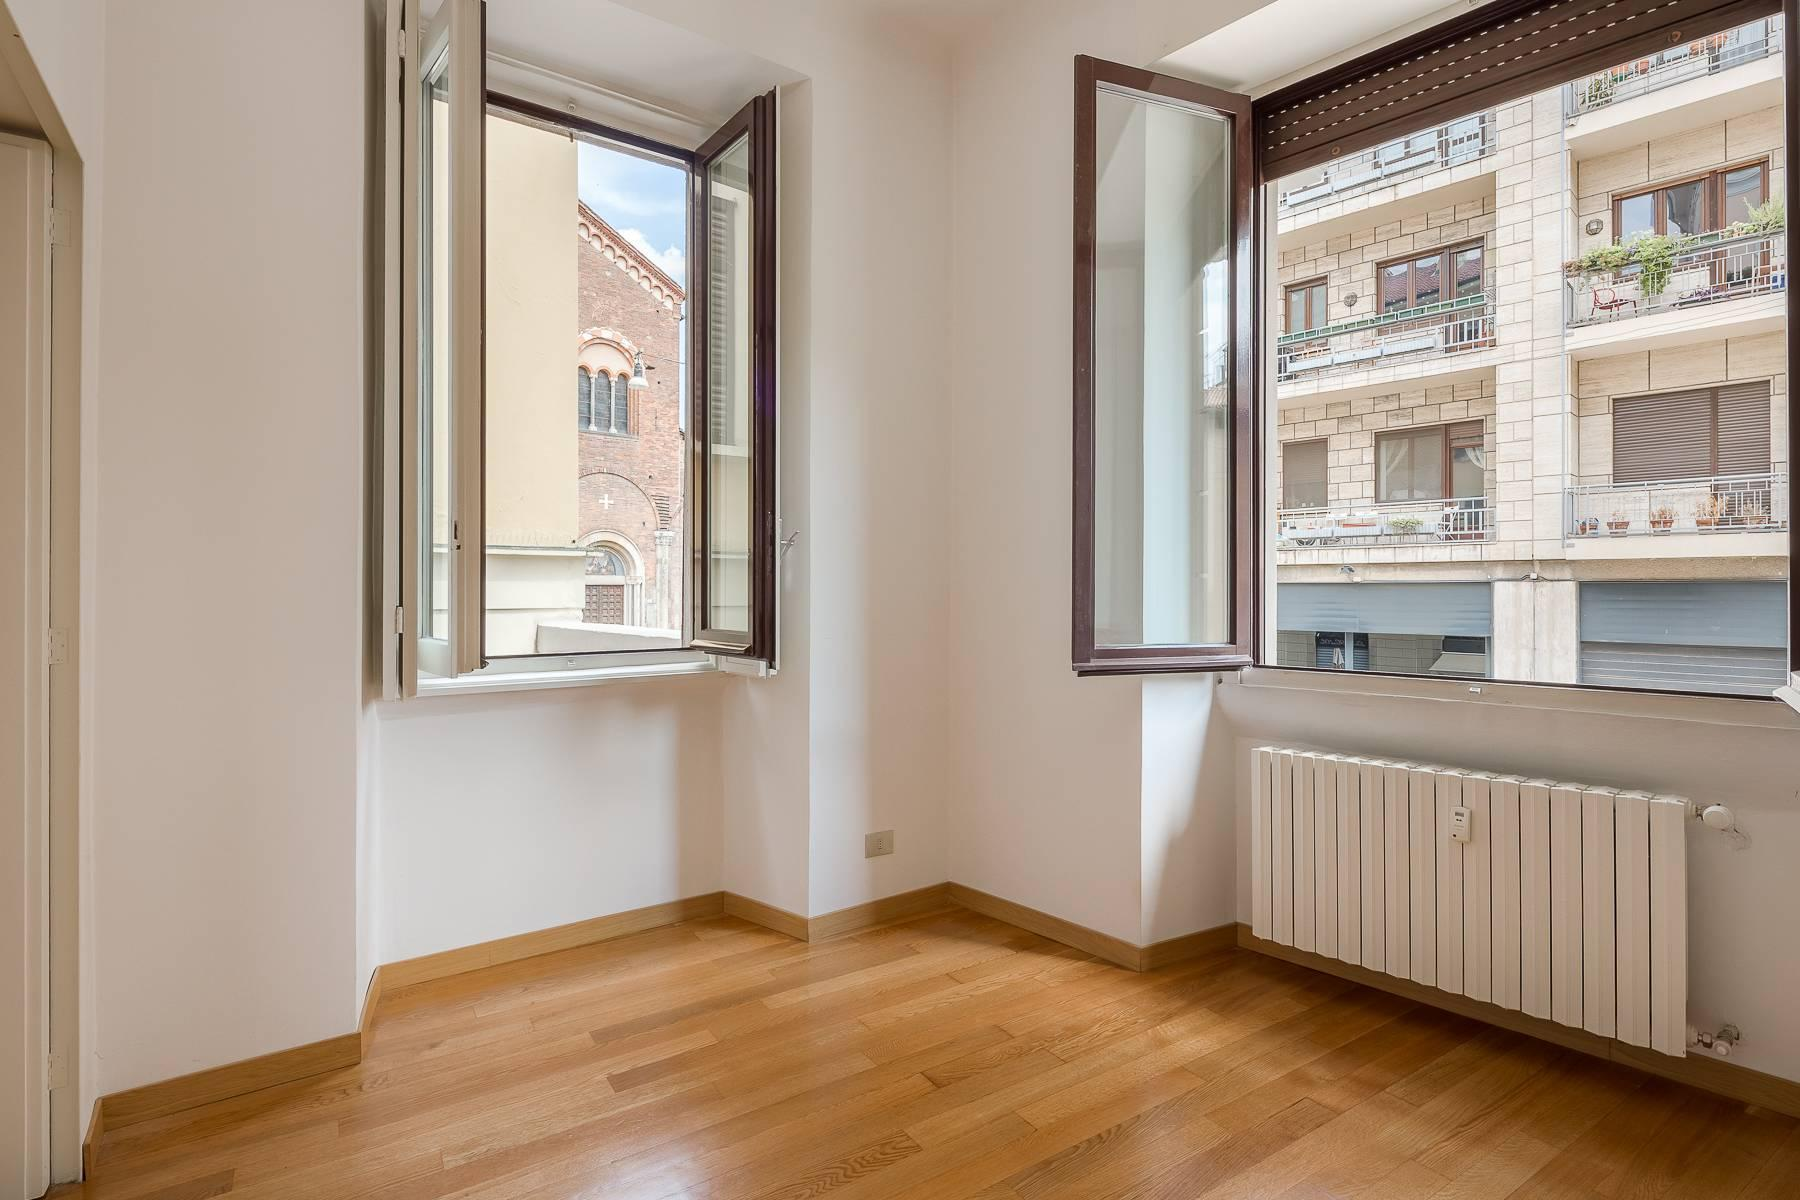 Apartment in an elegant period building located in a prestigious city district - 4